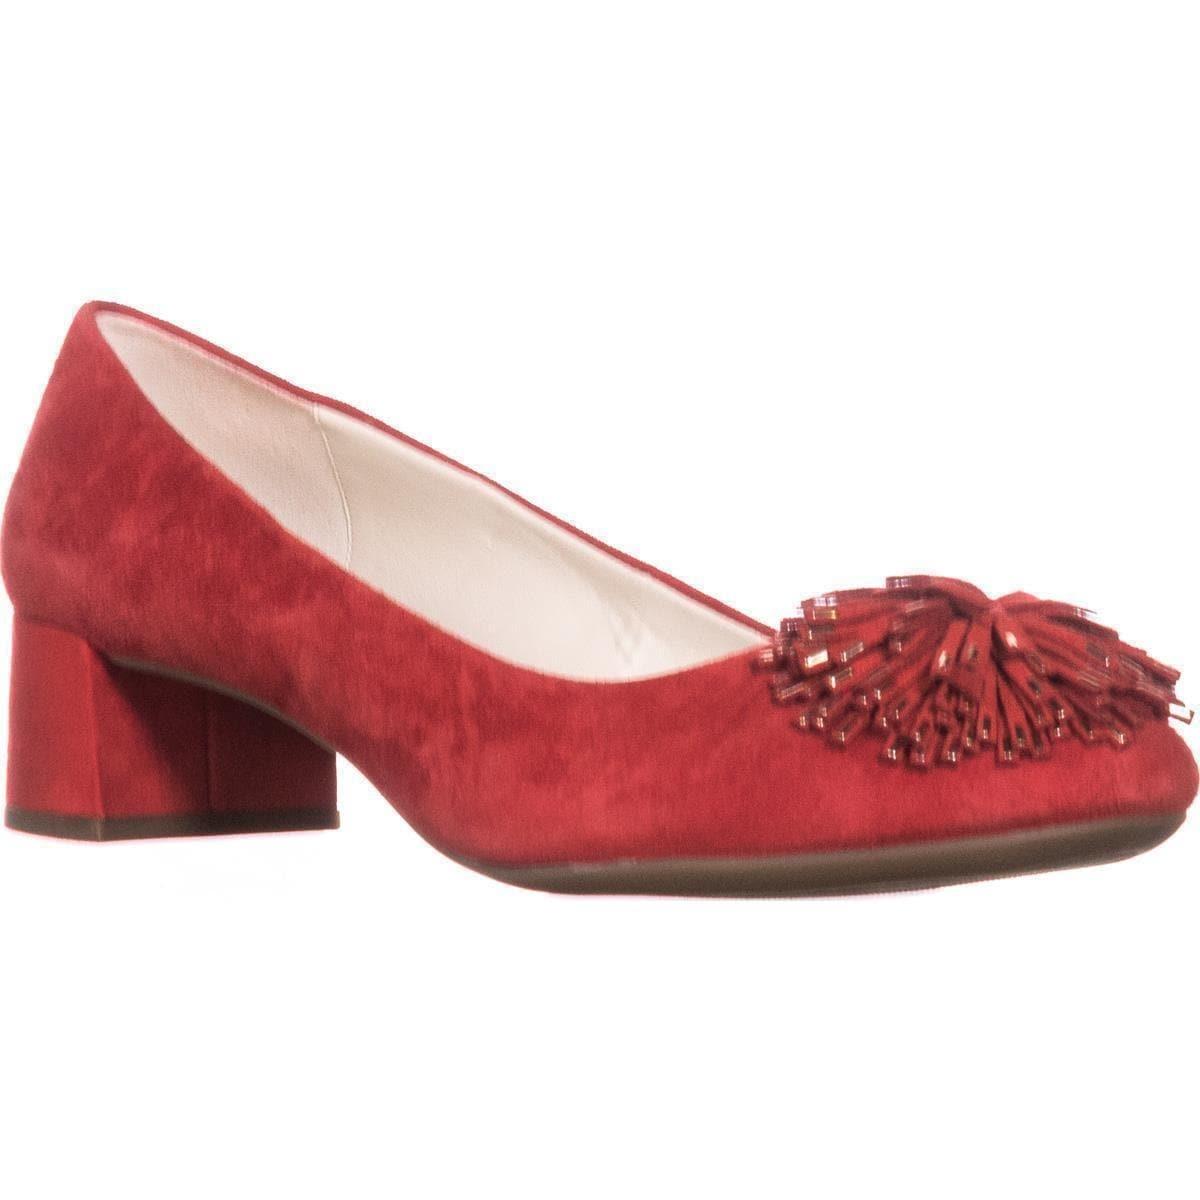 65114b21a80e Buy Anne Klein Women s Heels Online at Overstock